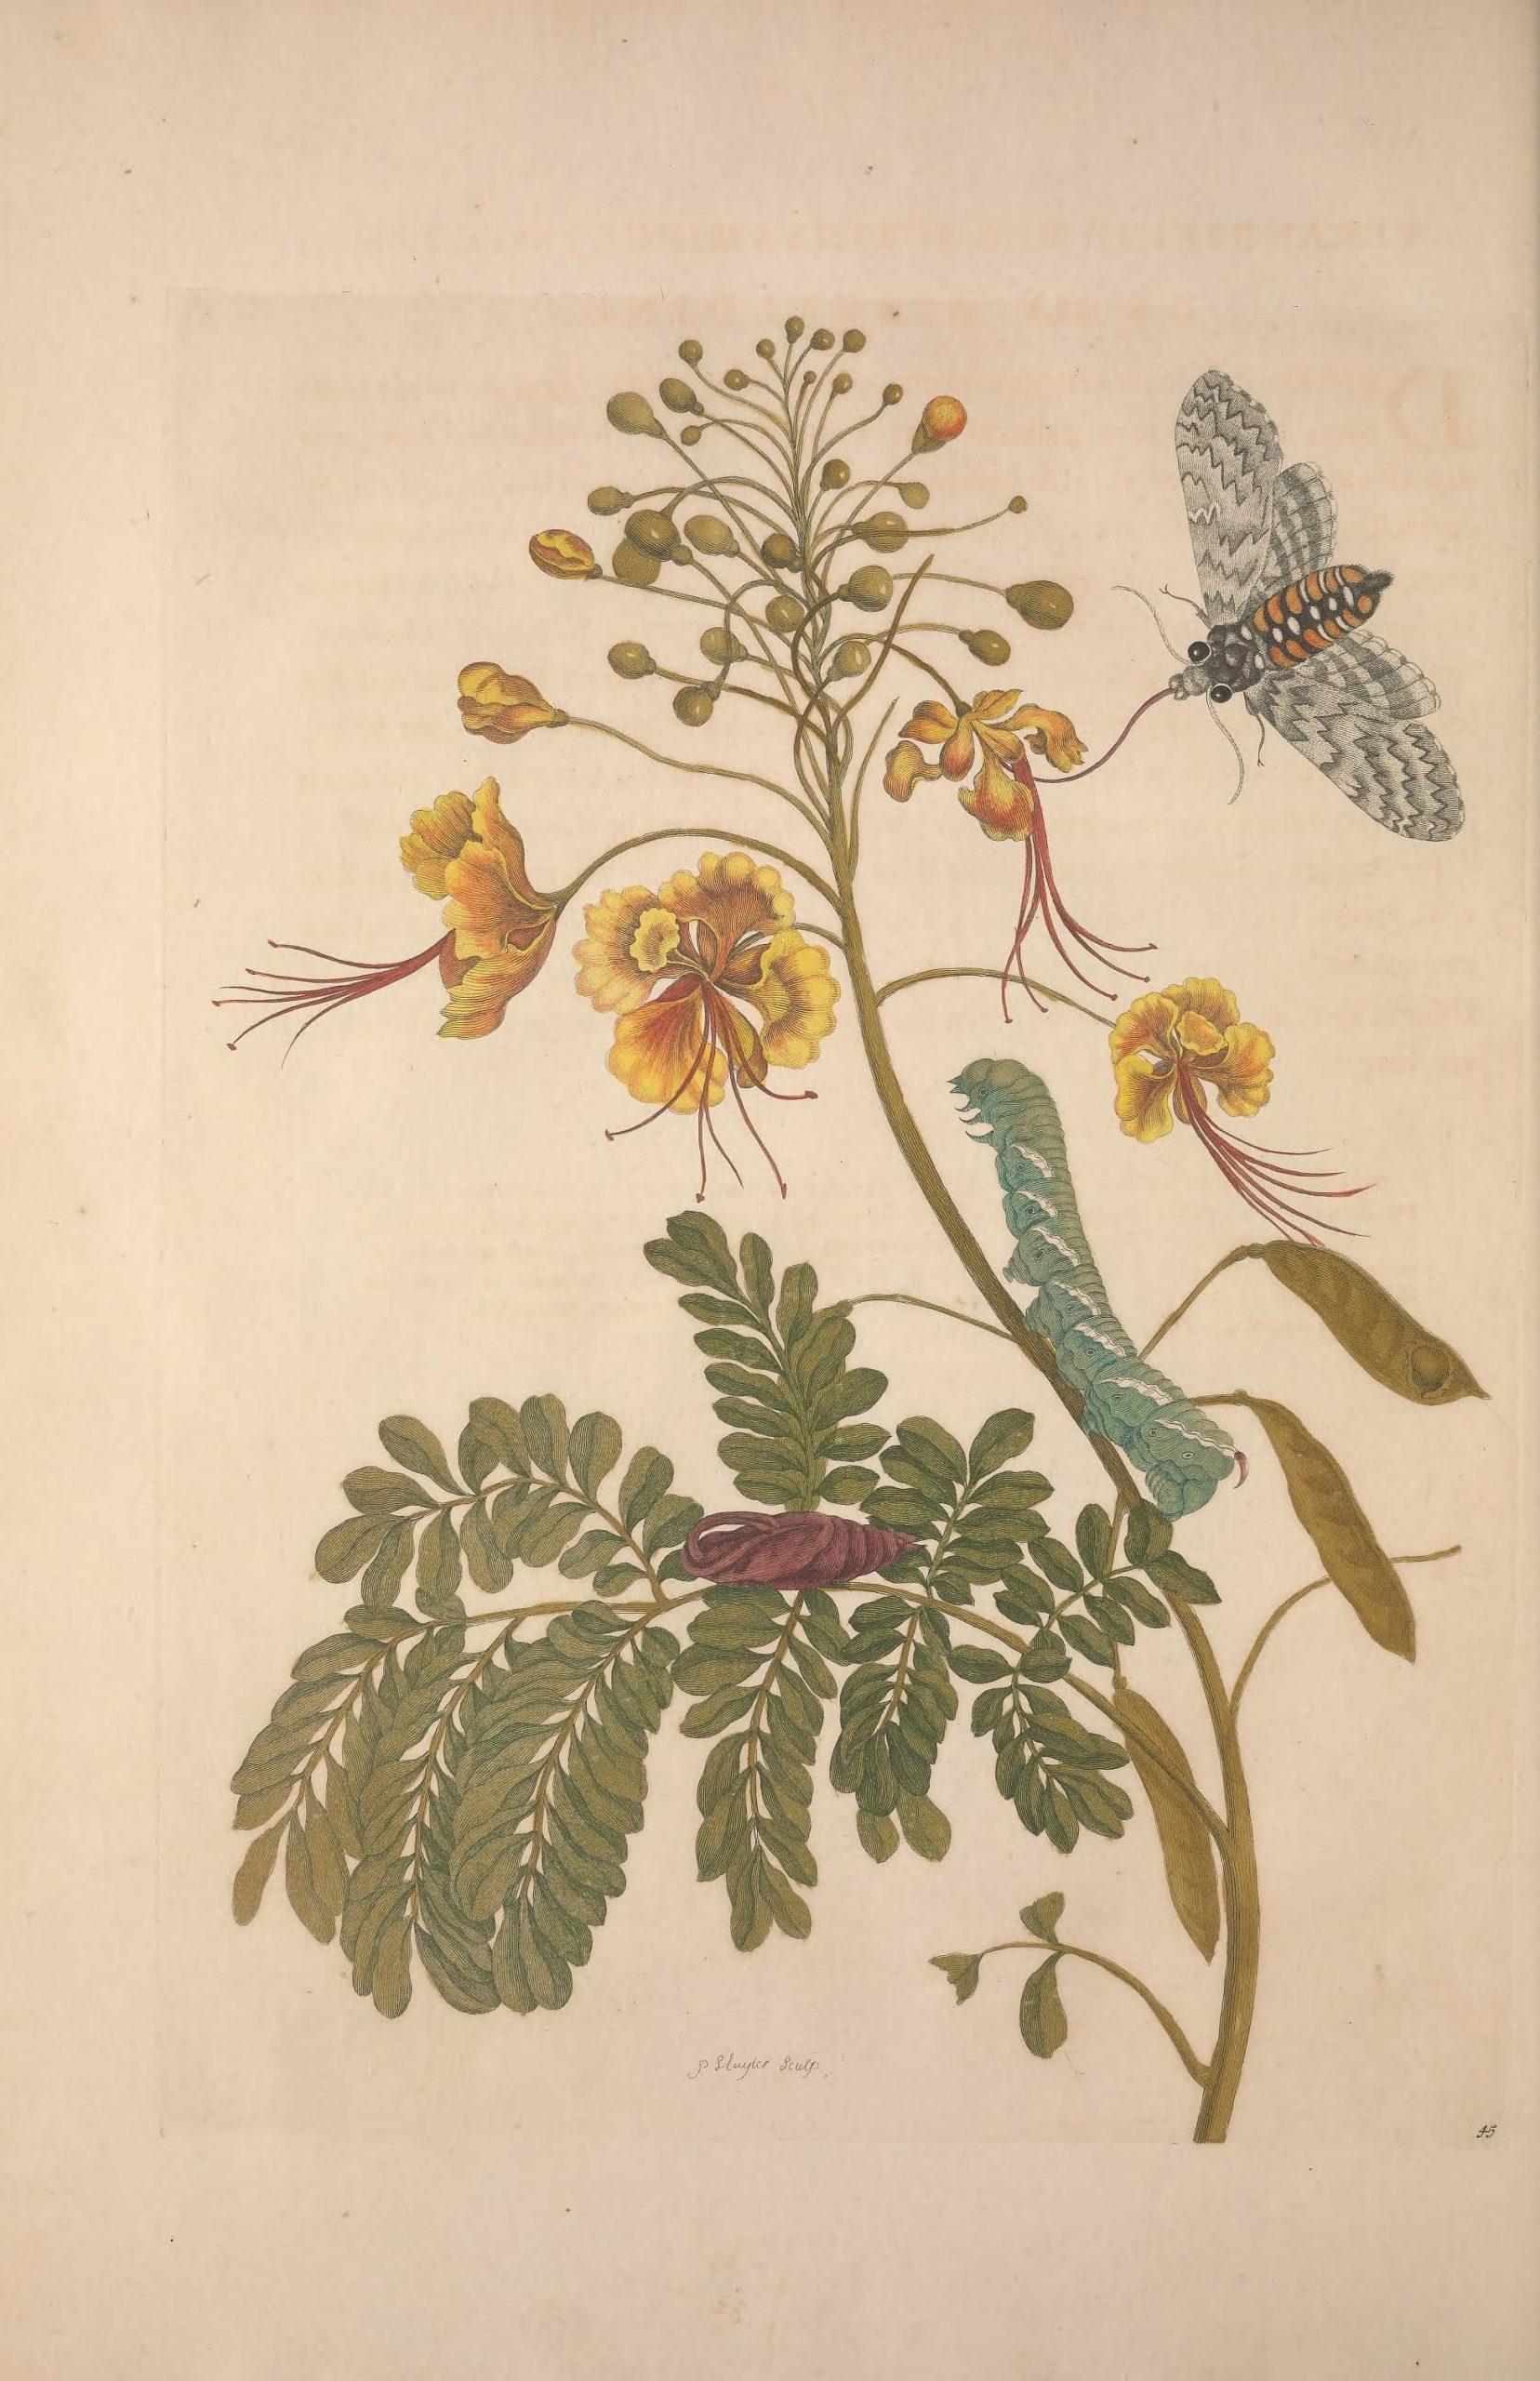 The peacock flower (Caesalpinia pulcherrima) with its seeds and the life cycle of the Caroline Sphinx Moth (Manduca sexta). Found in Metamorphosis insectorum surinamensium 1705, plate 45.